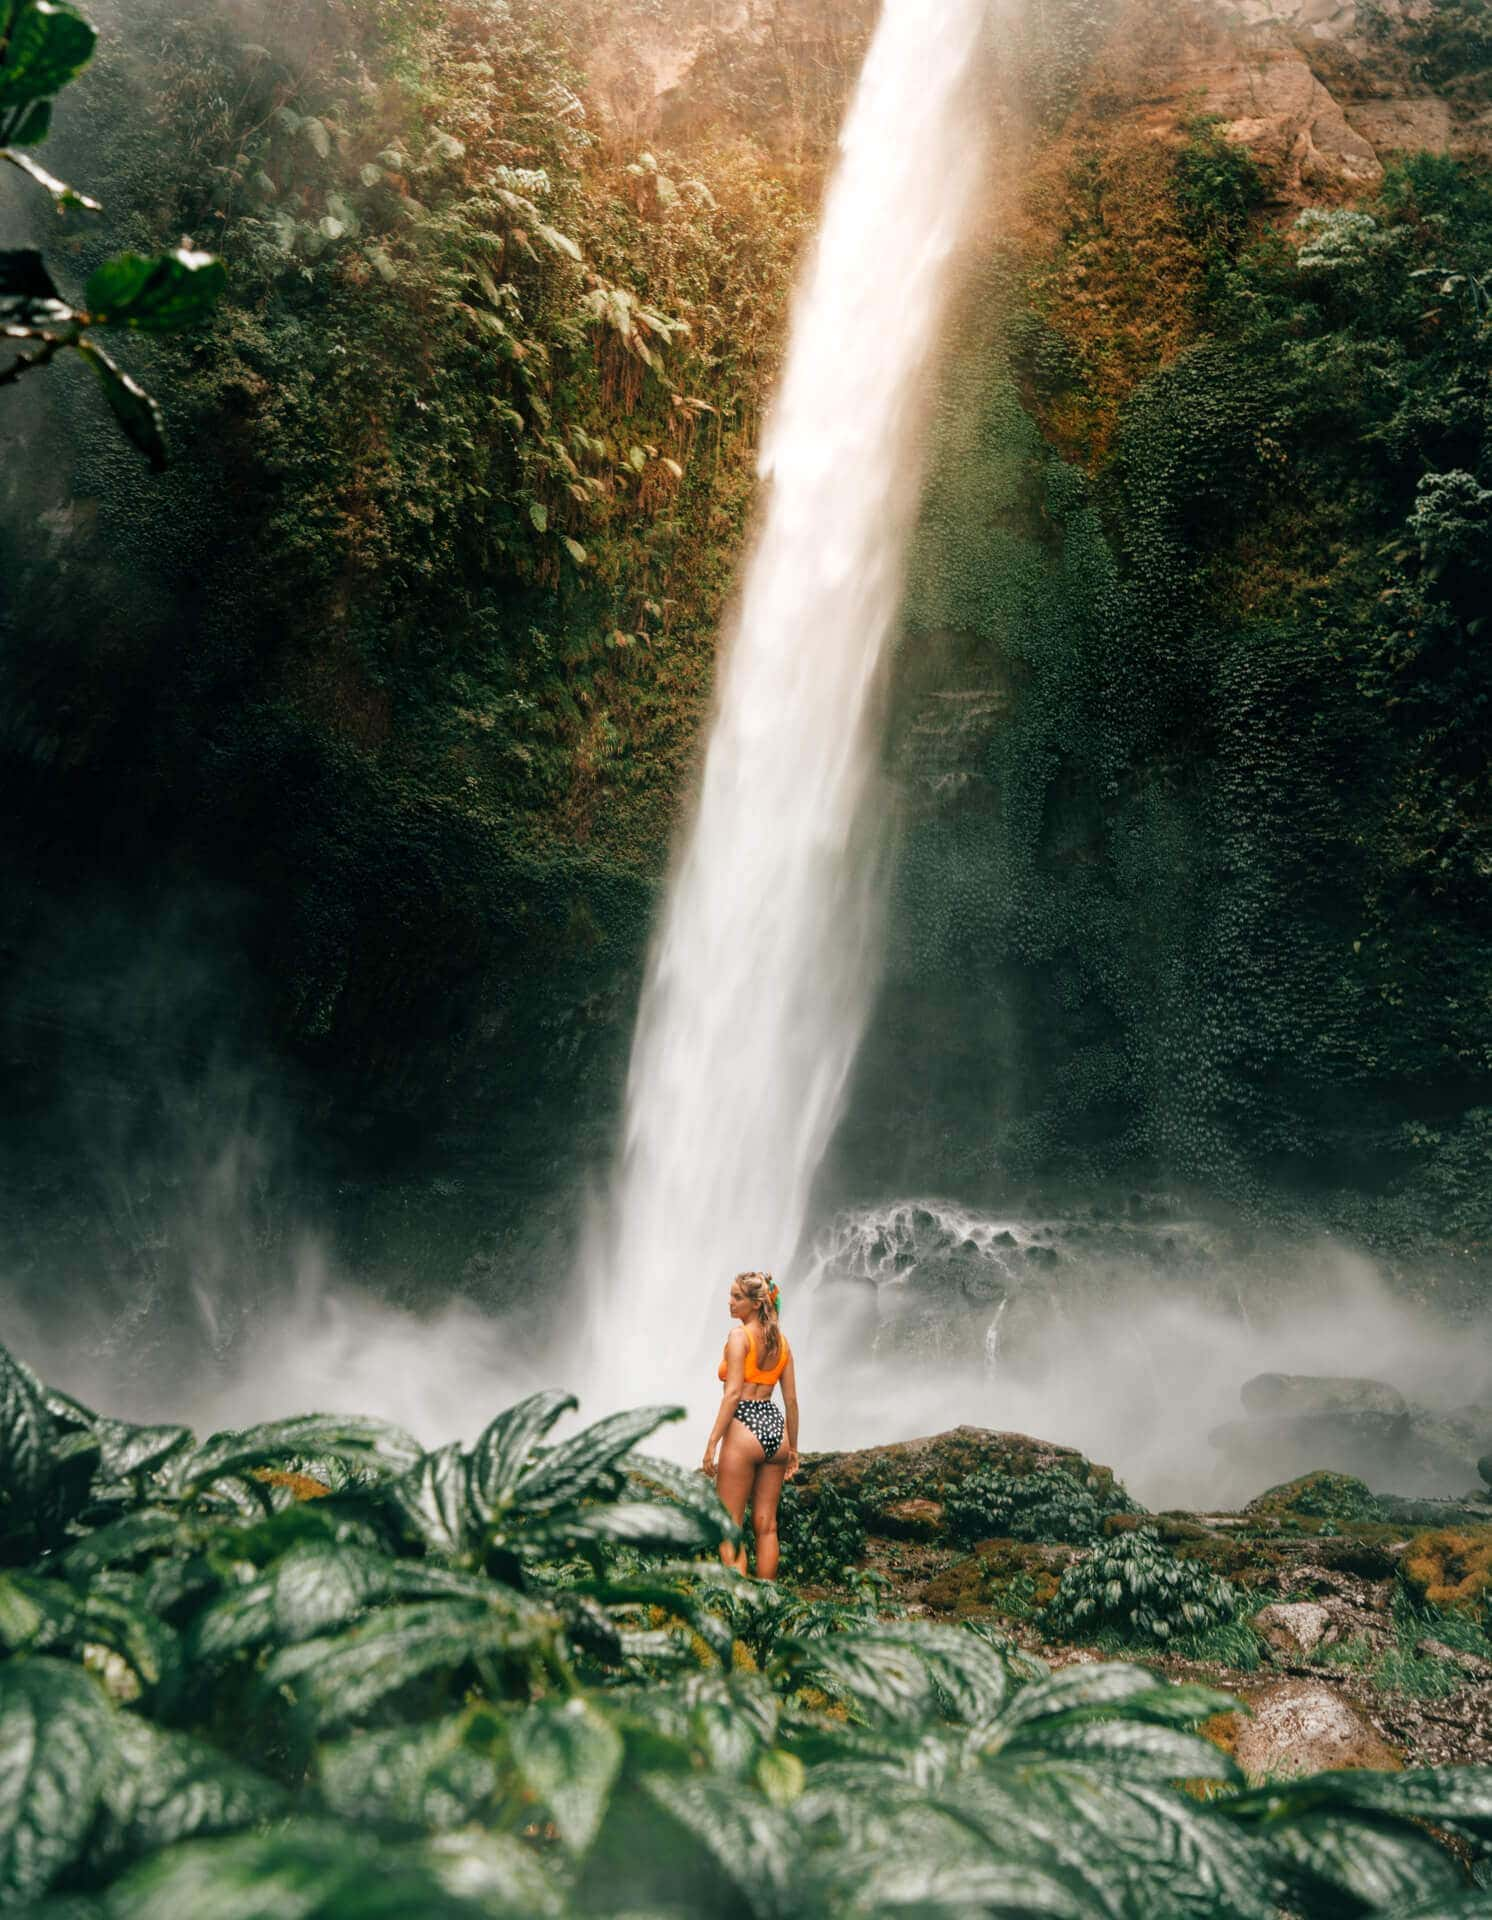 bromo ijen tour waterfall